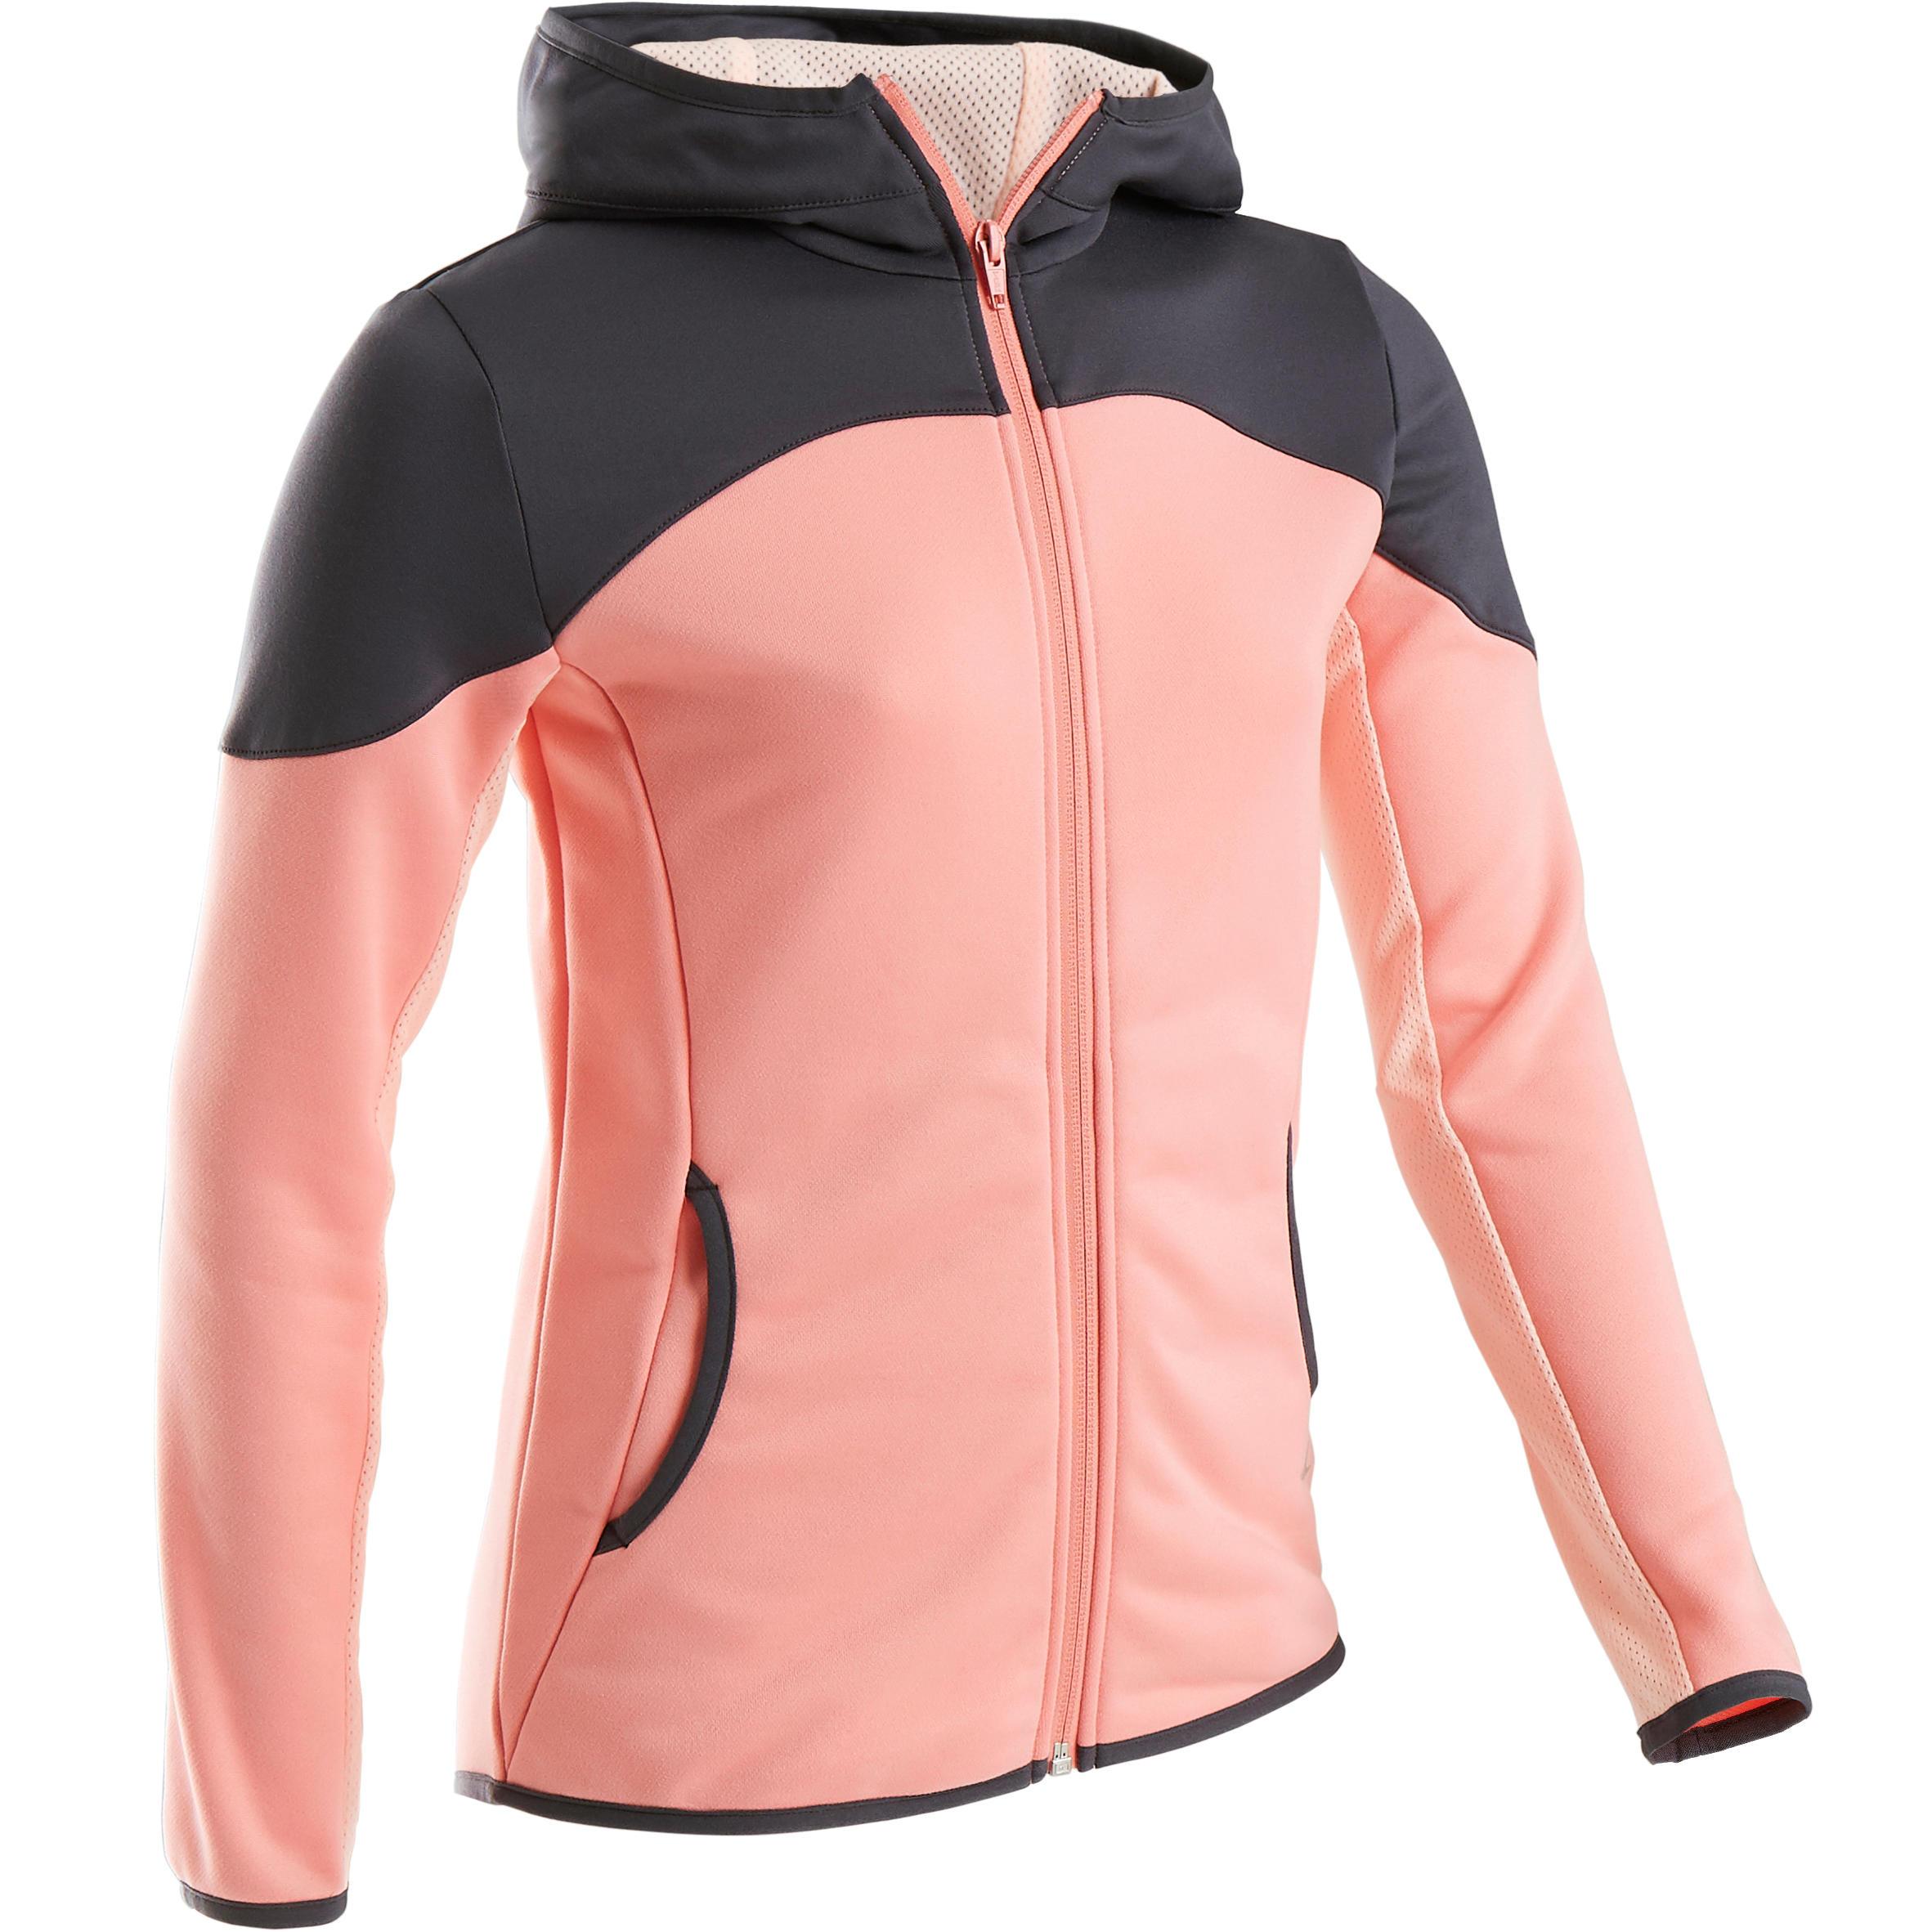 Jachetă respirantă S500 fete